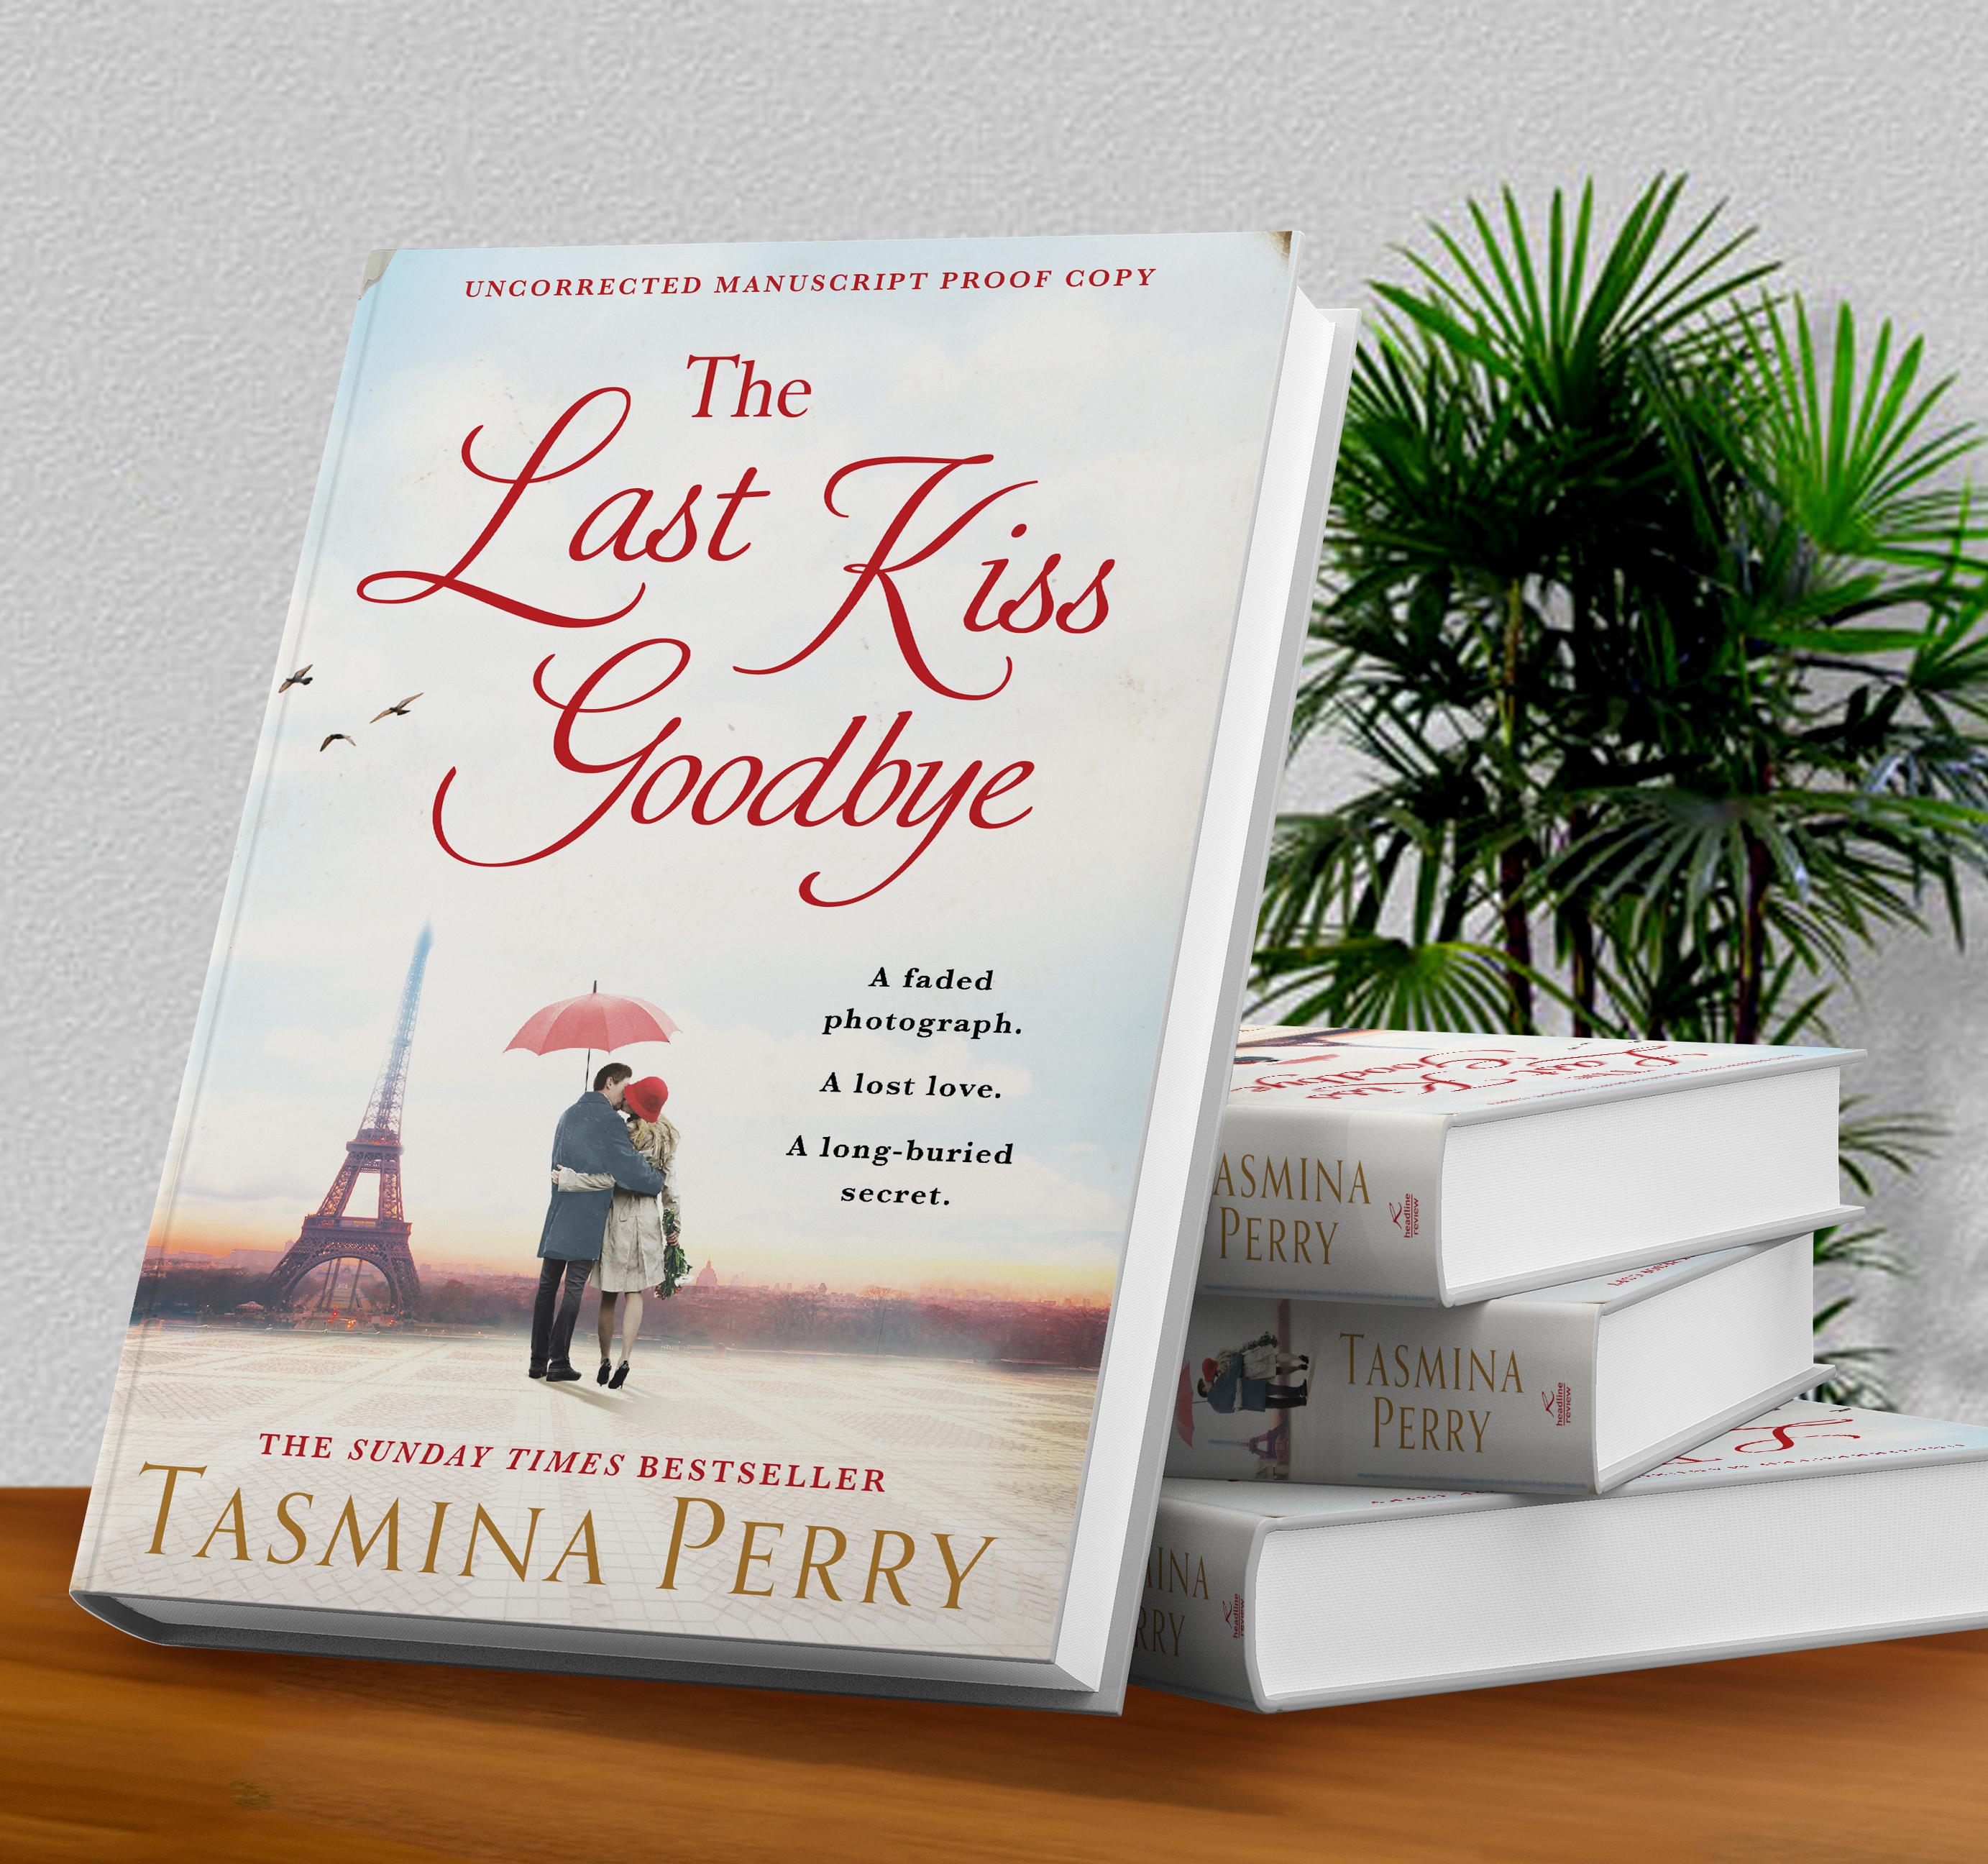 Last Kiss Goodbye proof cover